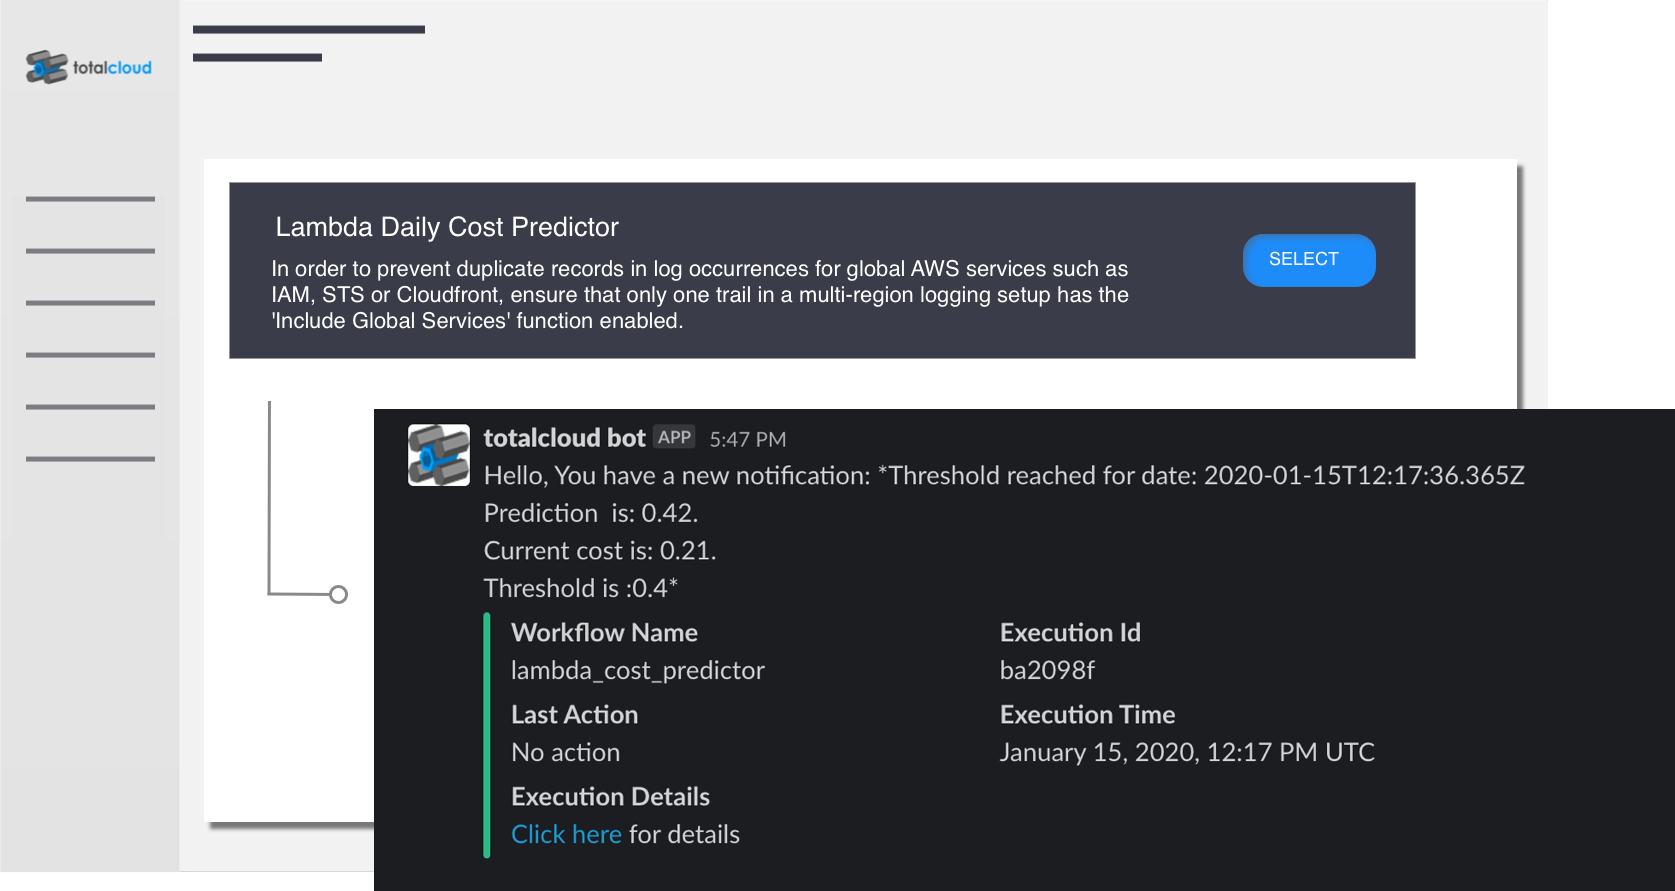 AWS Lambda Daily Cost Predictor